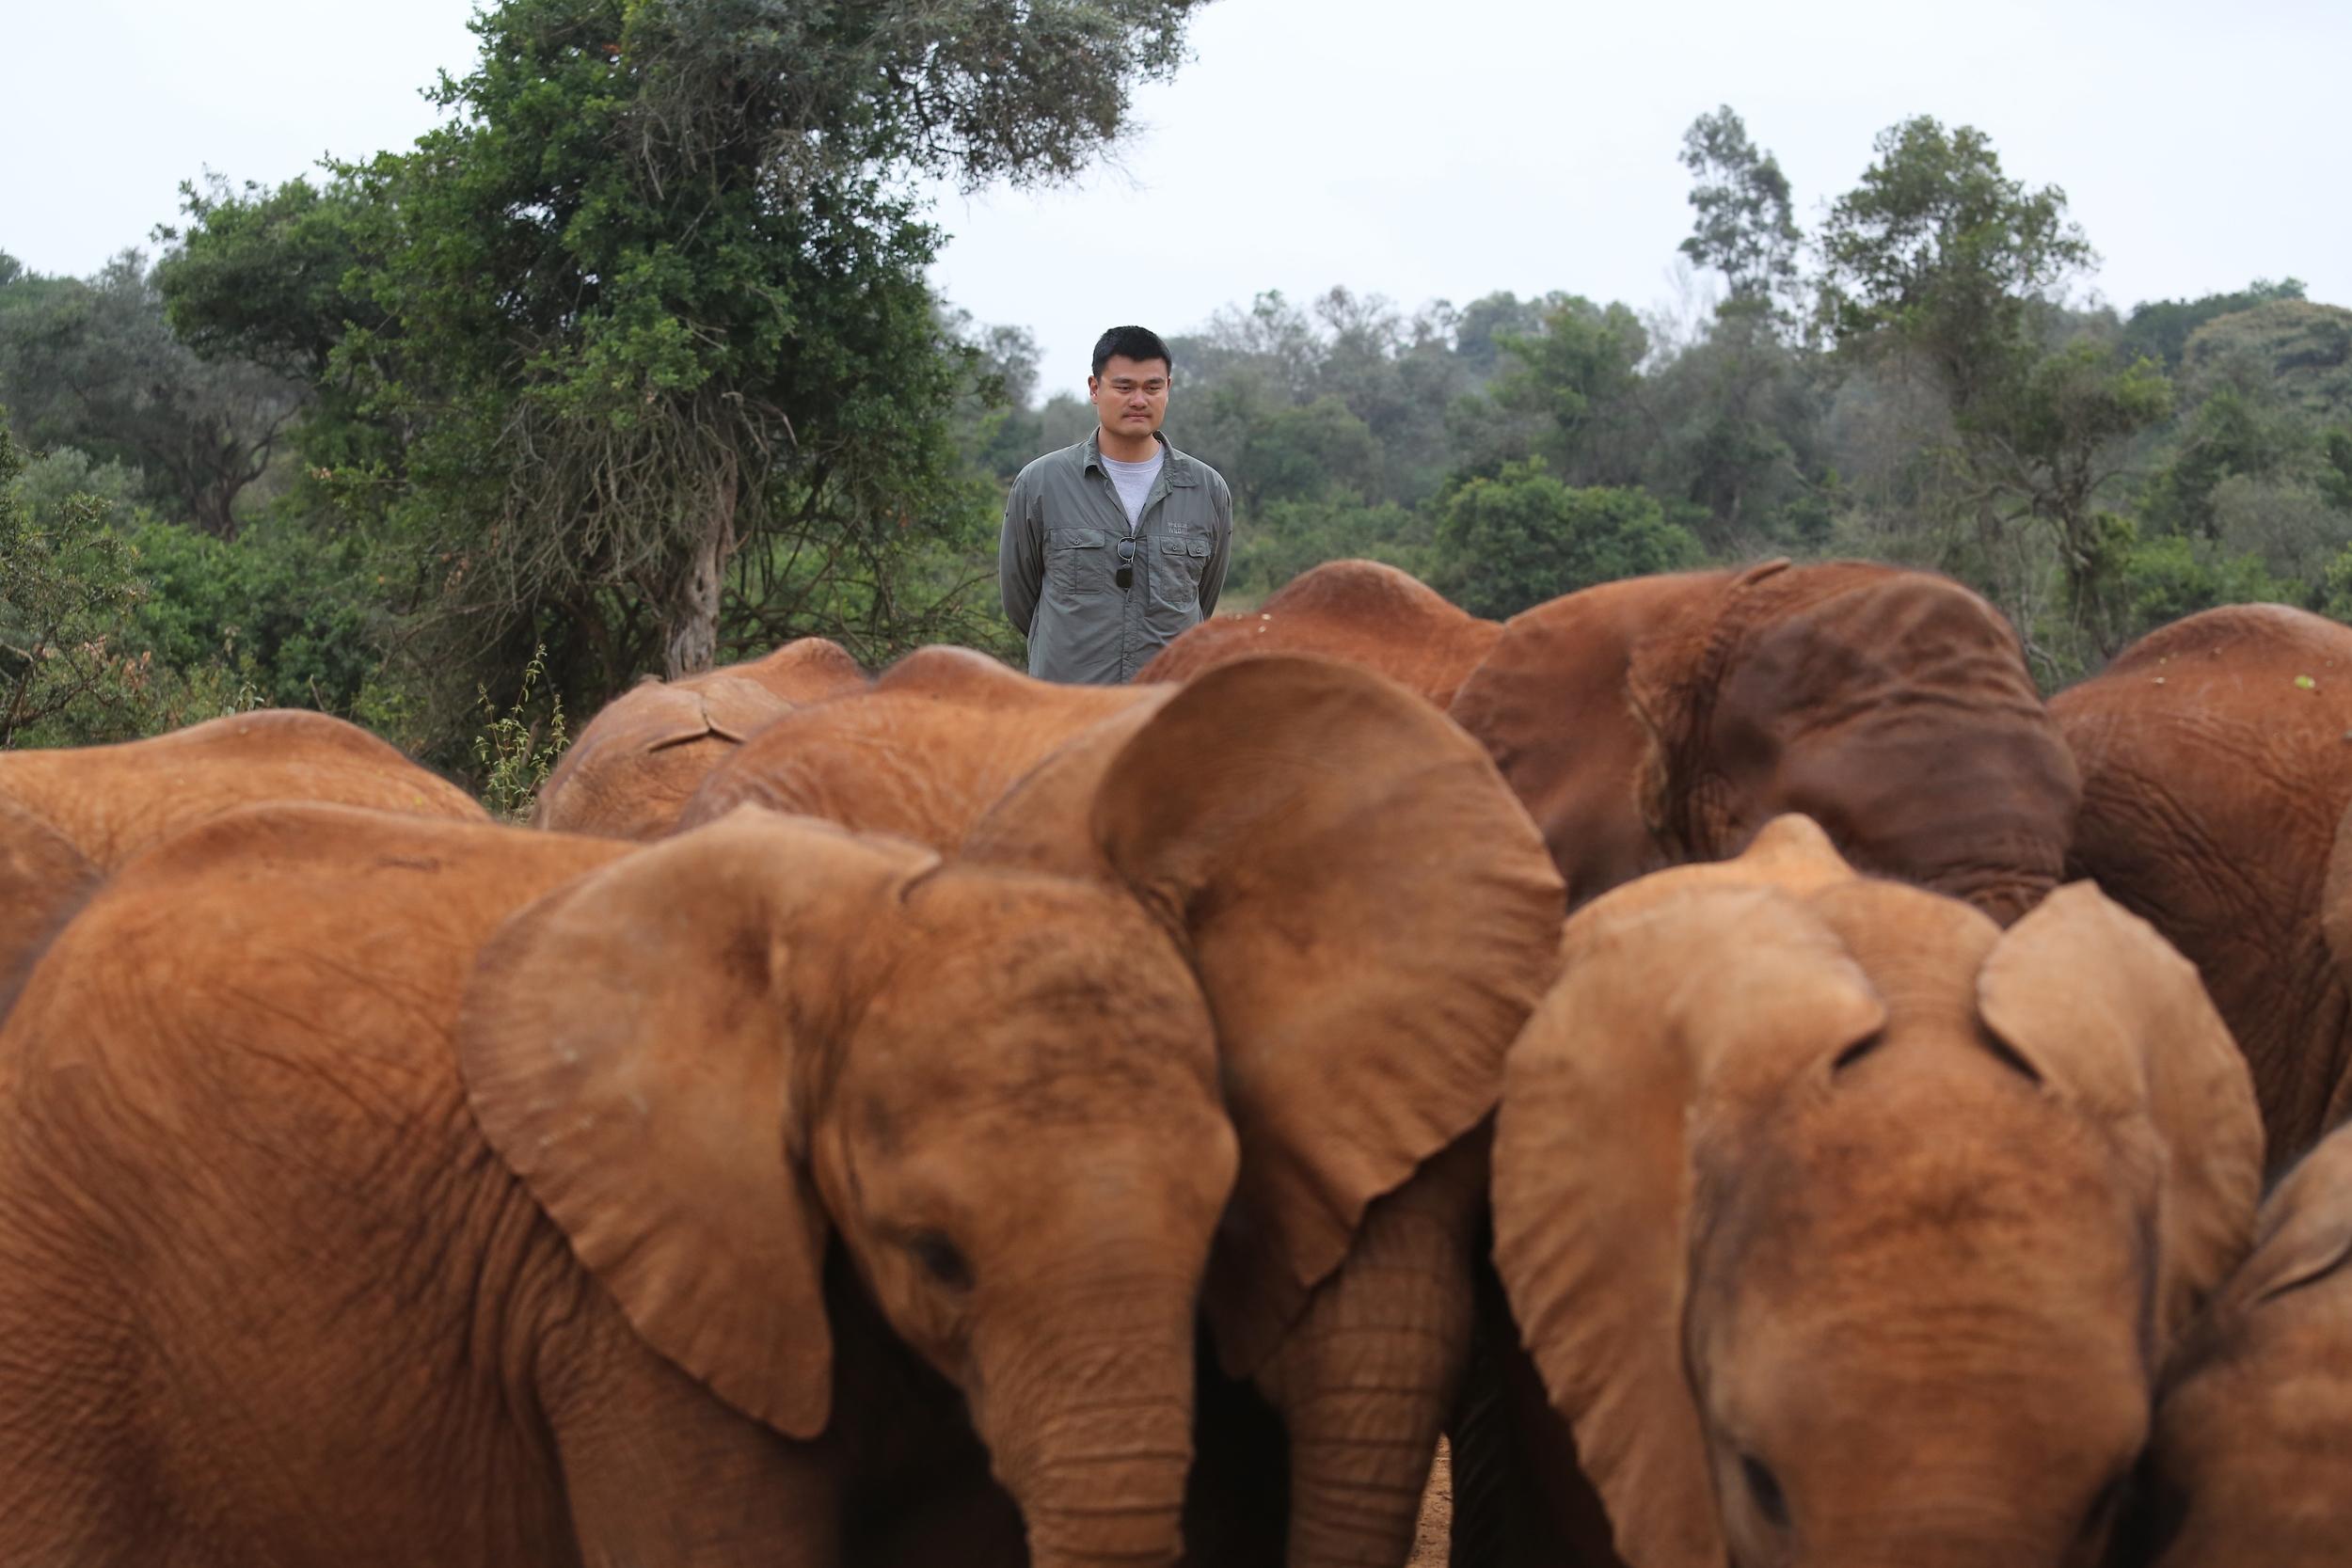 Former basketball star Yao Ming towers over orphaned elephants at the David Sheldrick Wildlife Trust in Nairobi